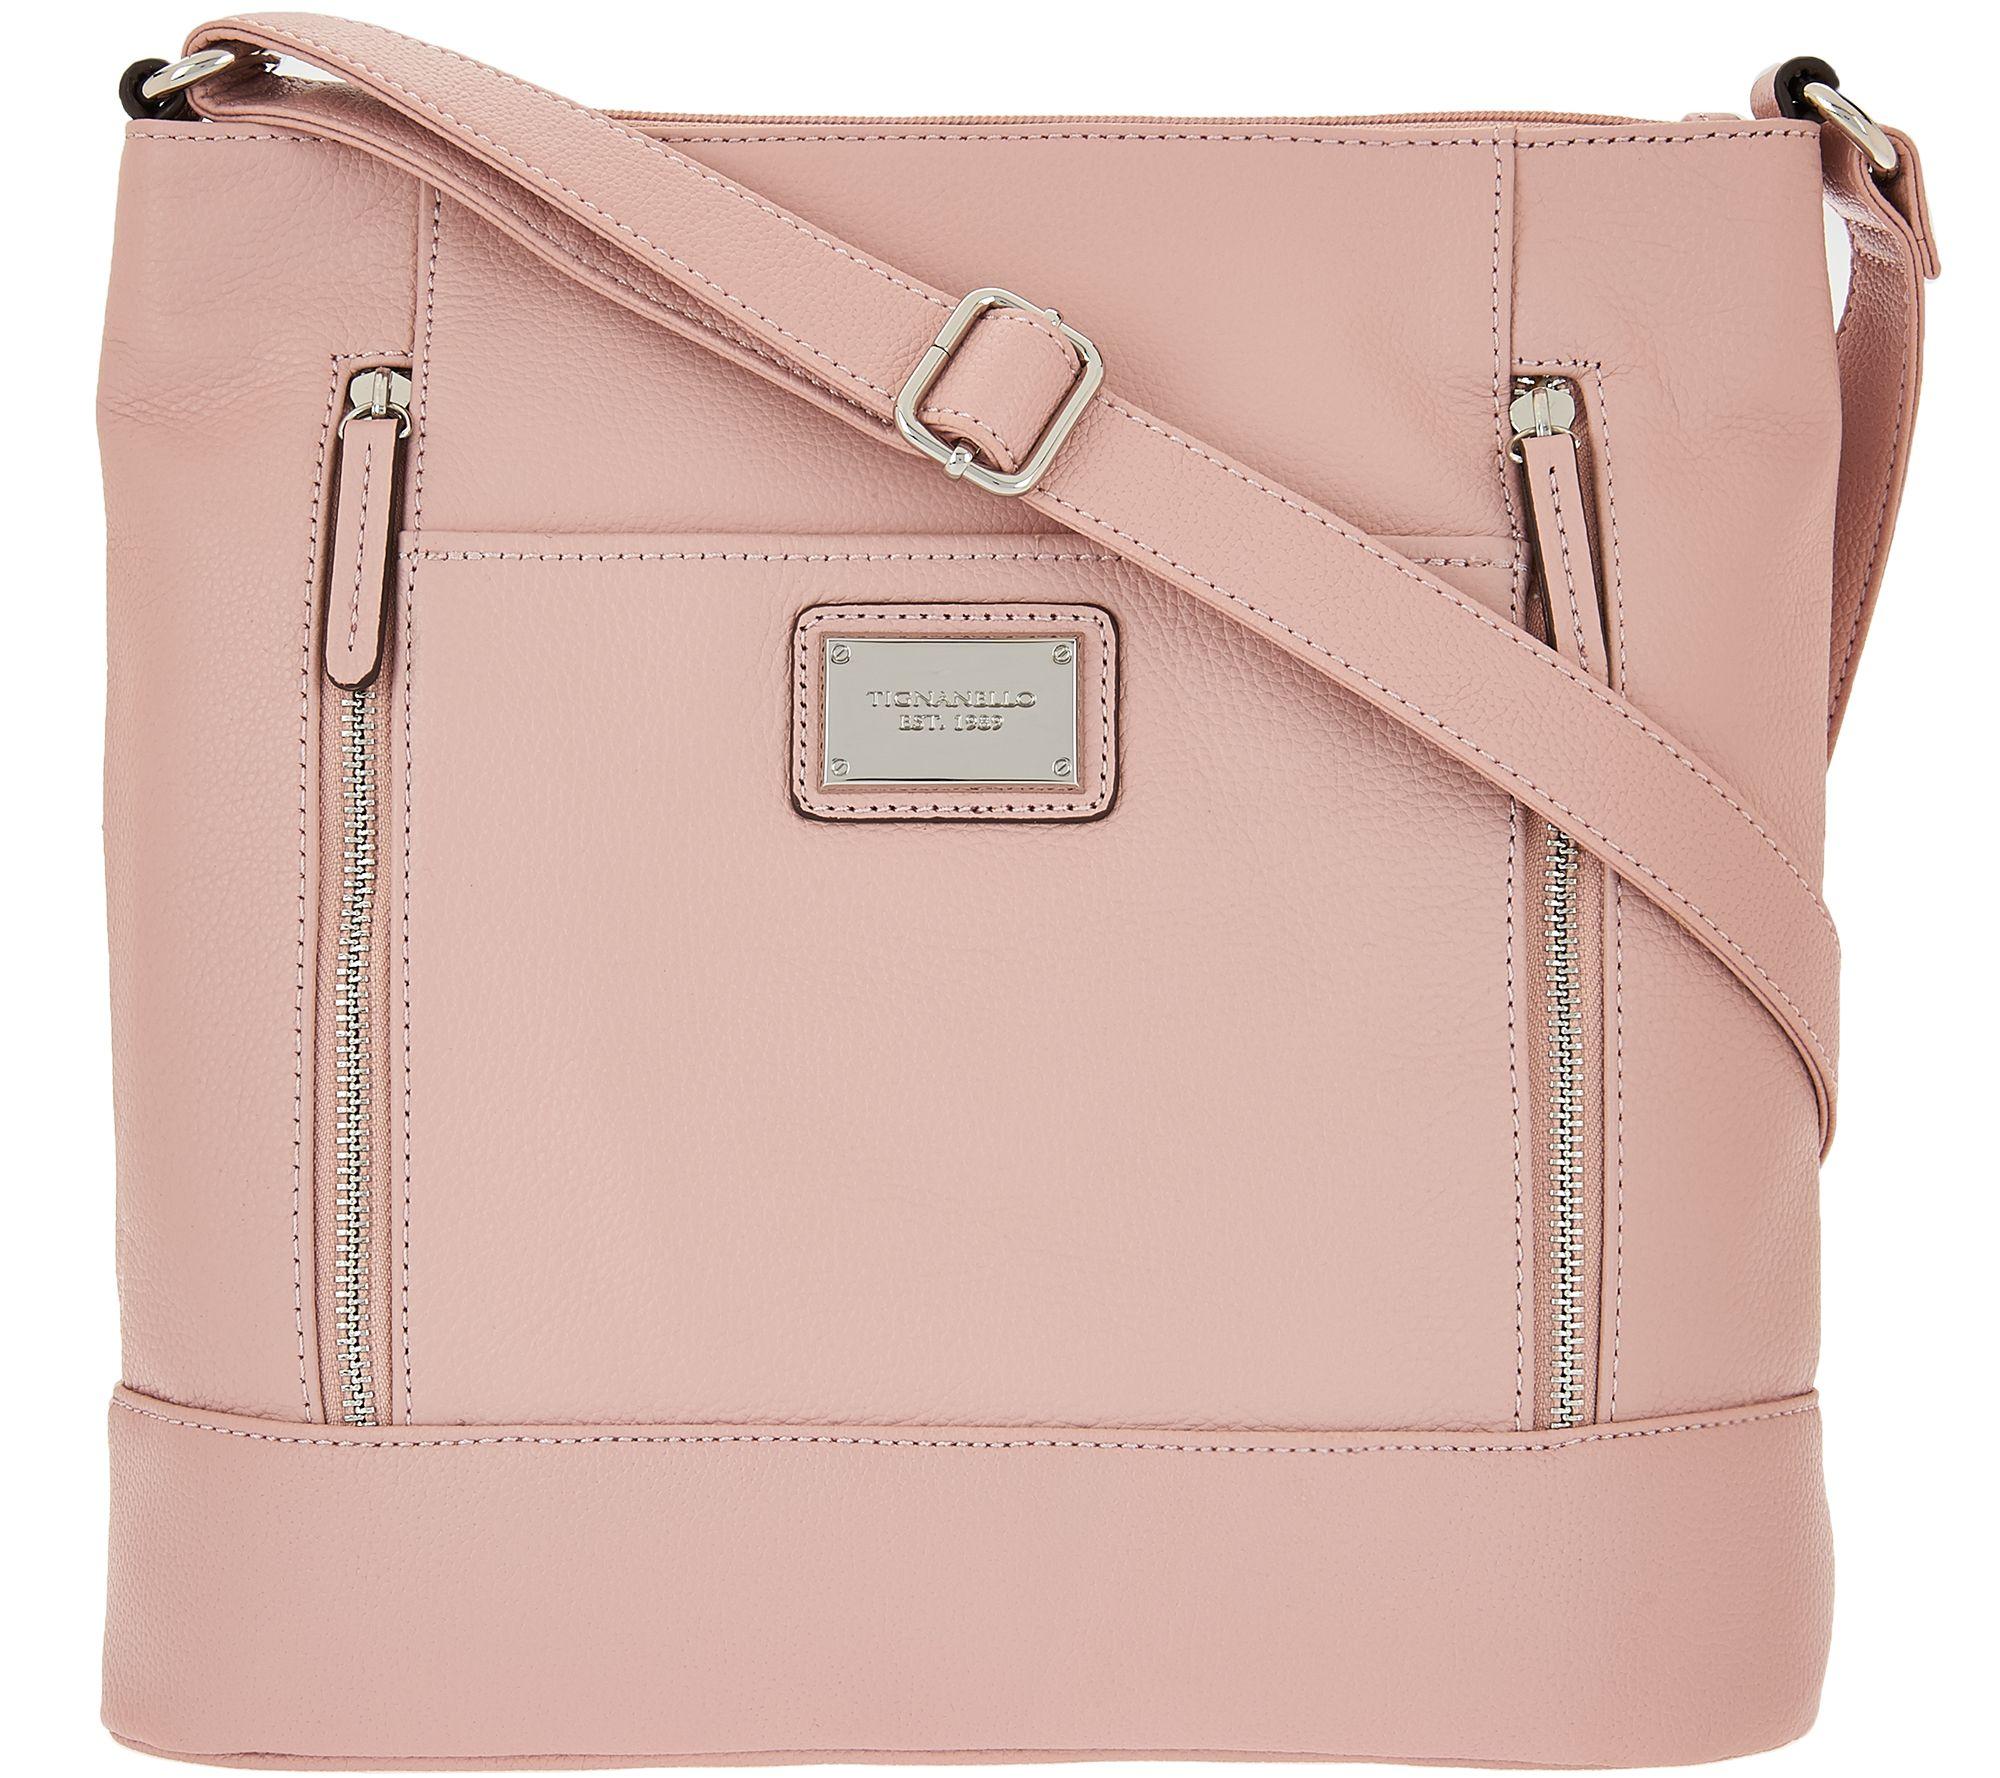 Tignanello Handbags Qvc Handbag